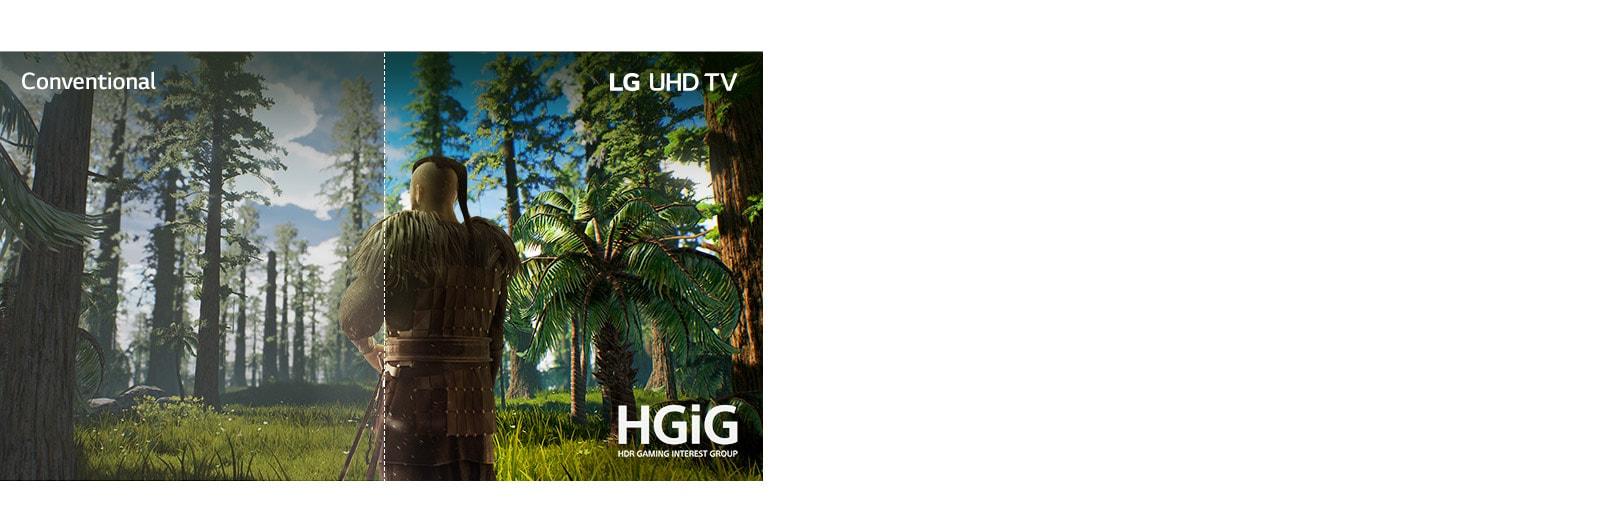 LG 43UN7190PTA HGiG profile